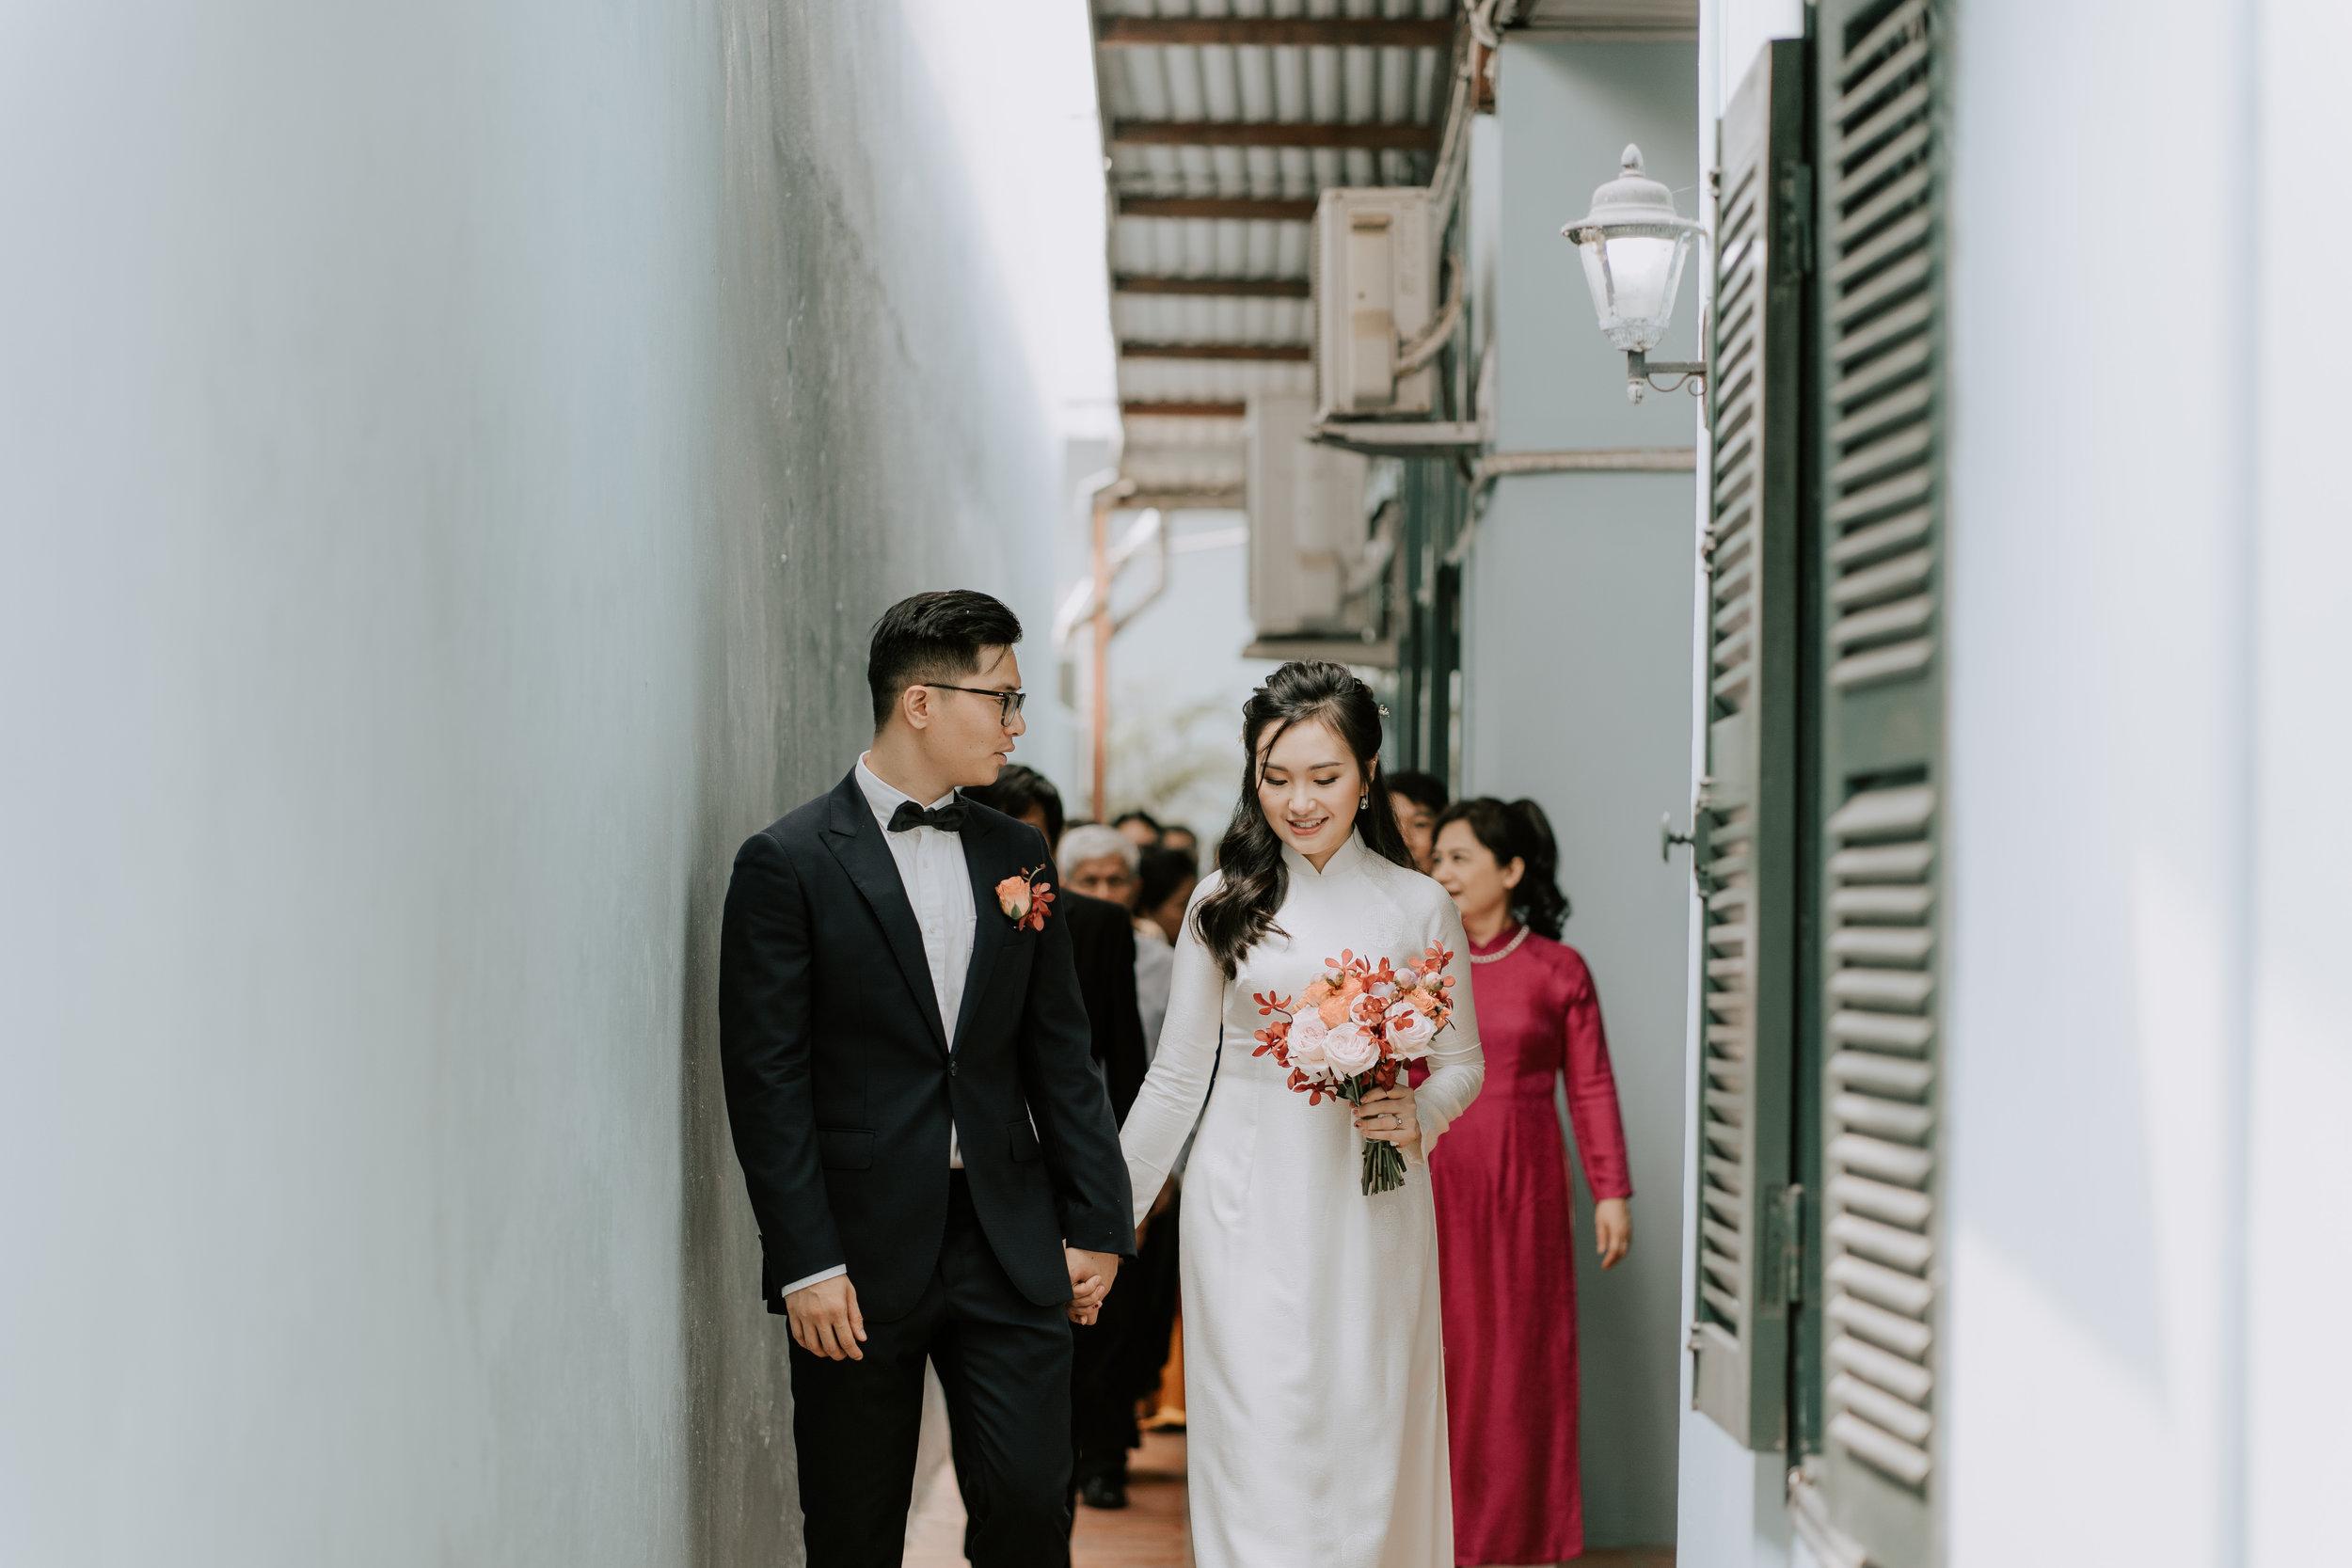 Mirrorwedding Destination Photographer TopofHanoi Duc Anh Hien Trang 093628.jpg